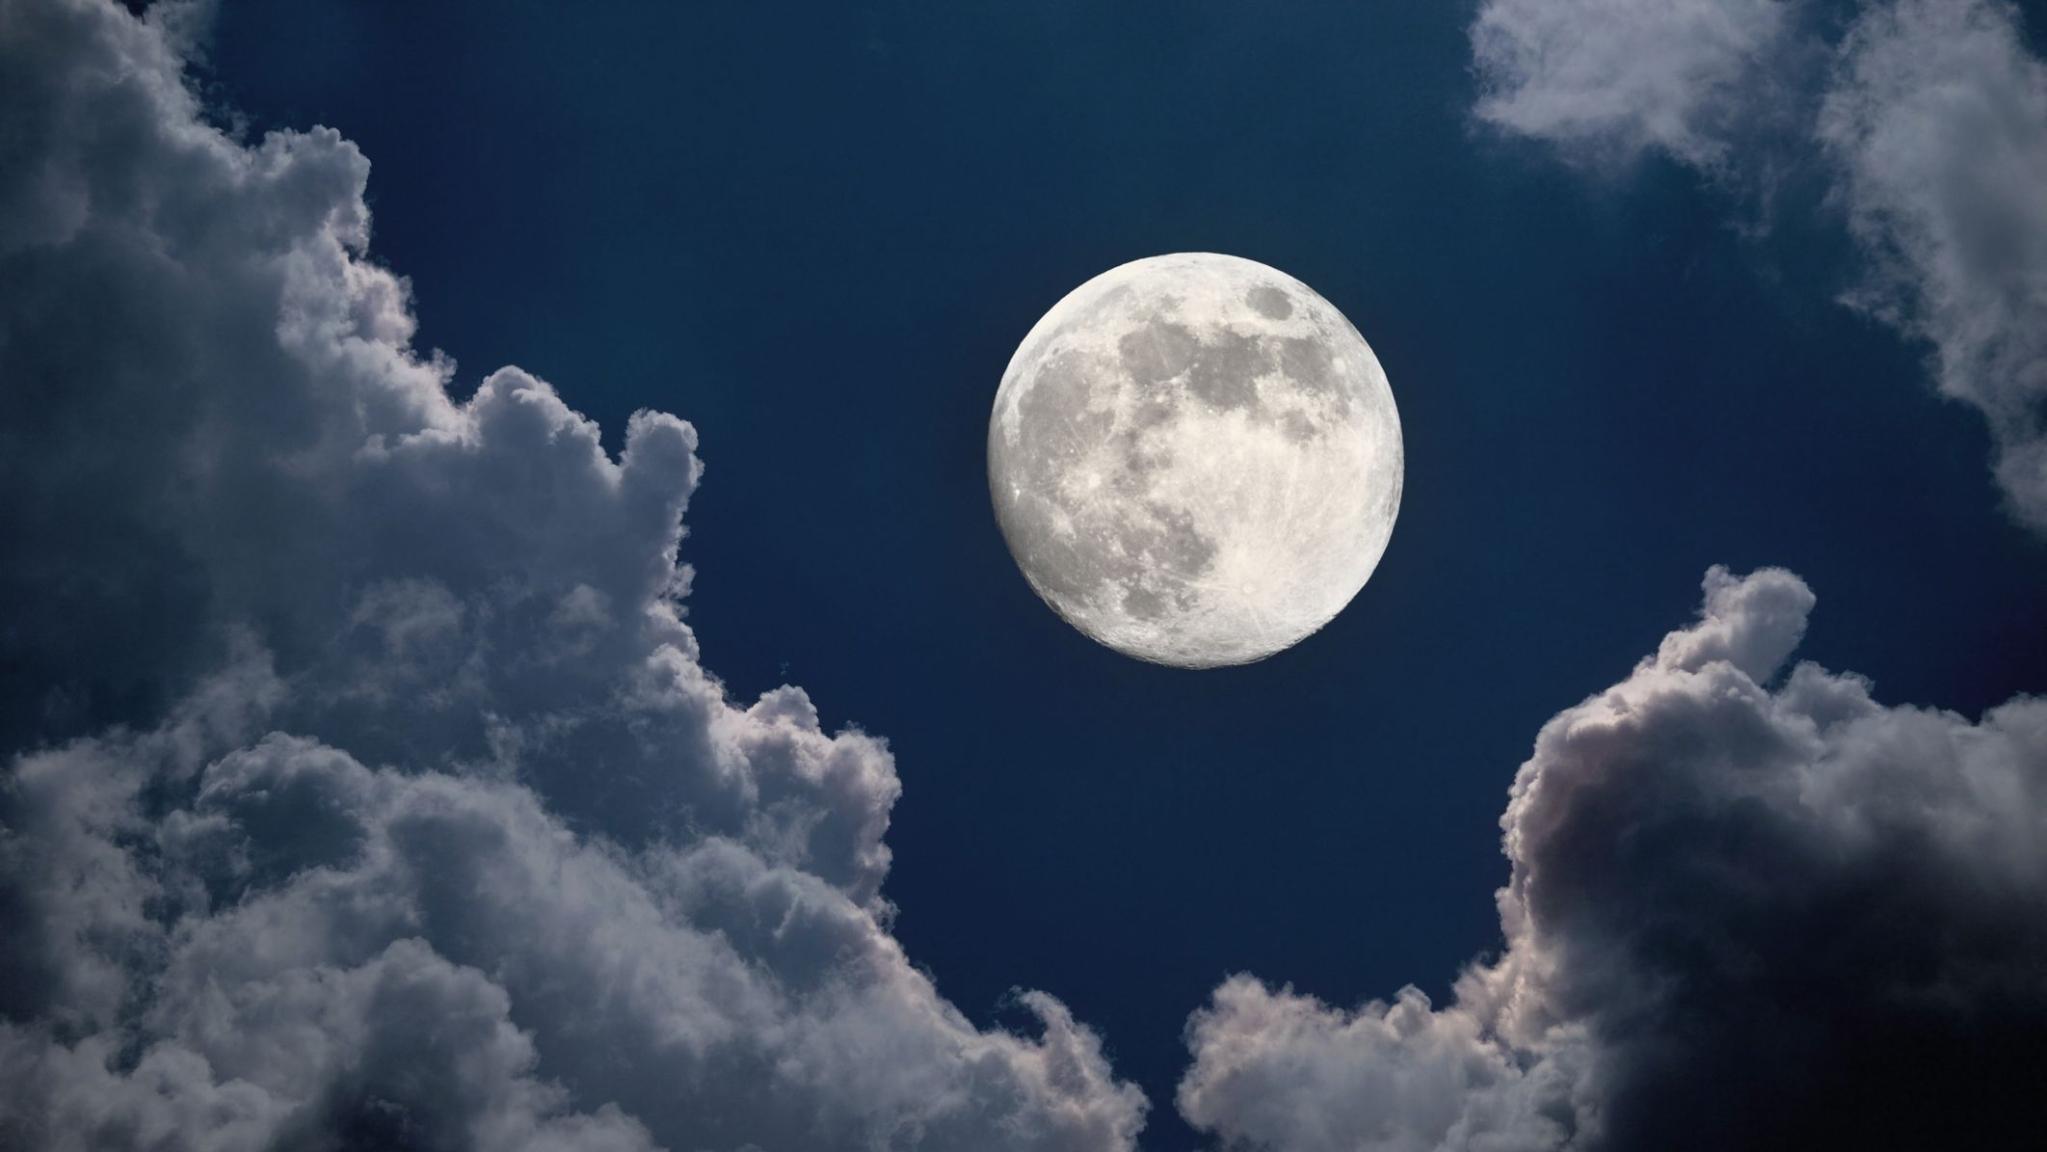 Moonrise in delhi today